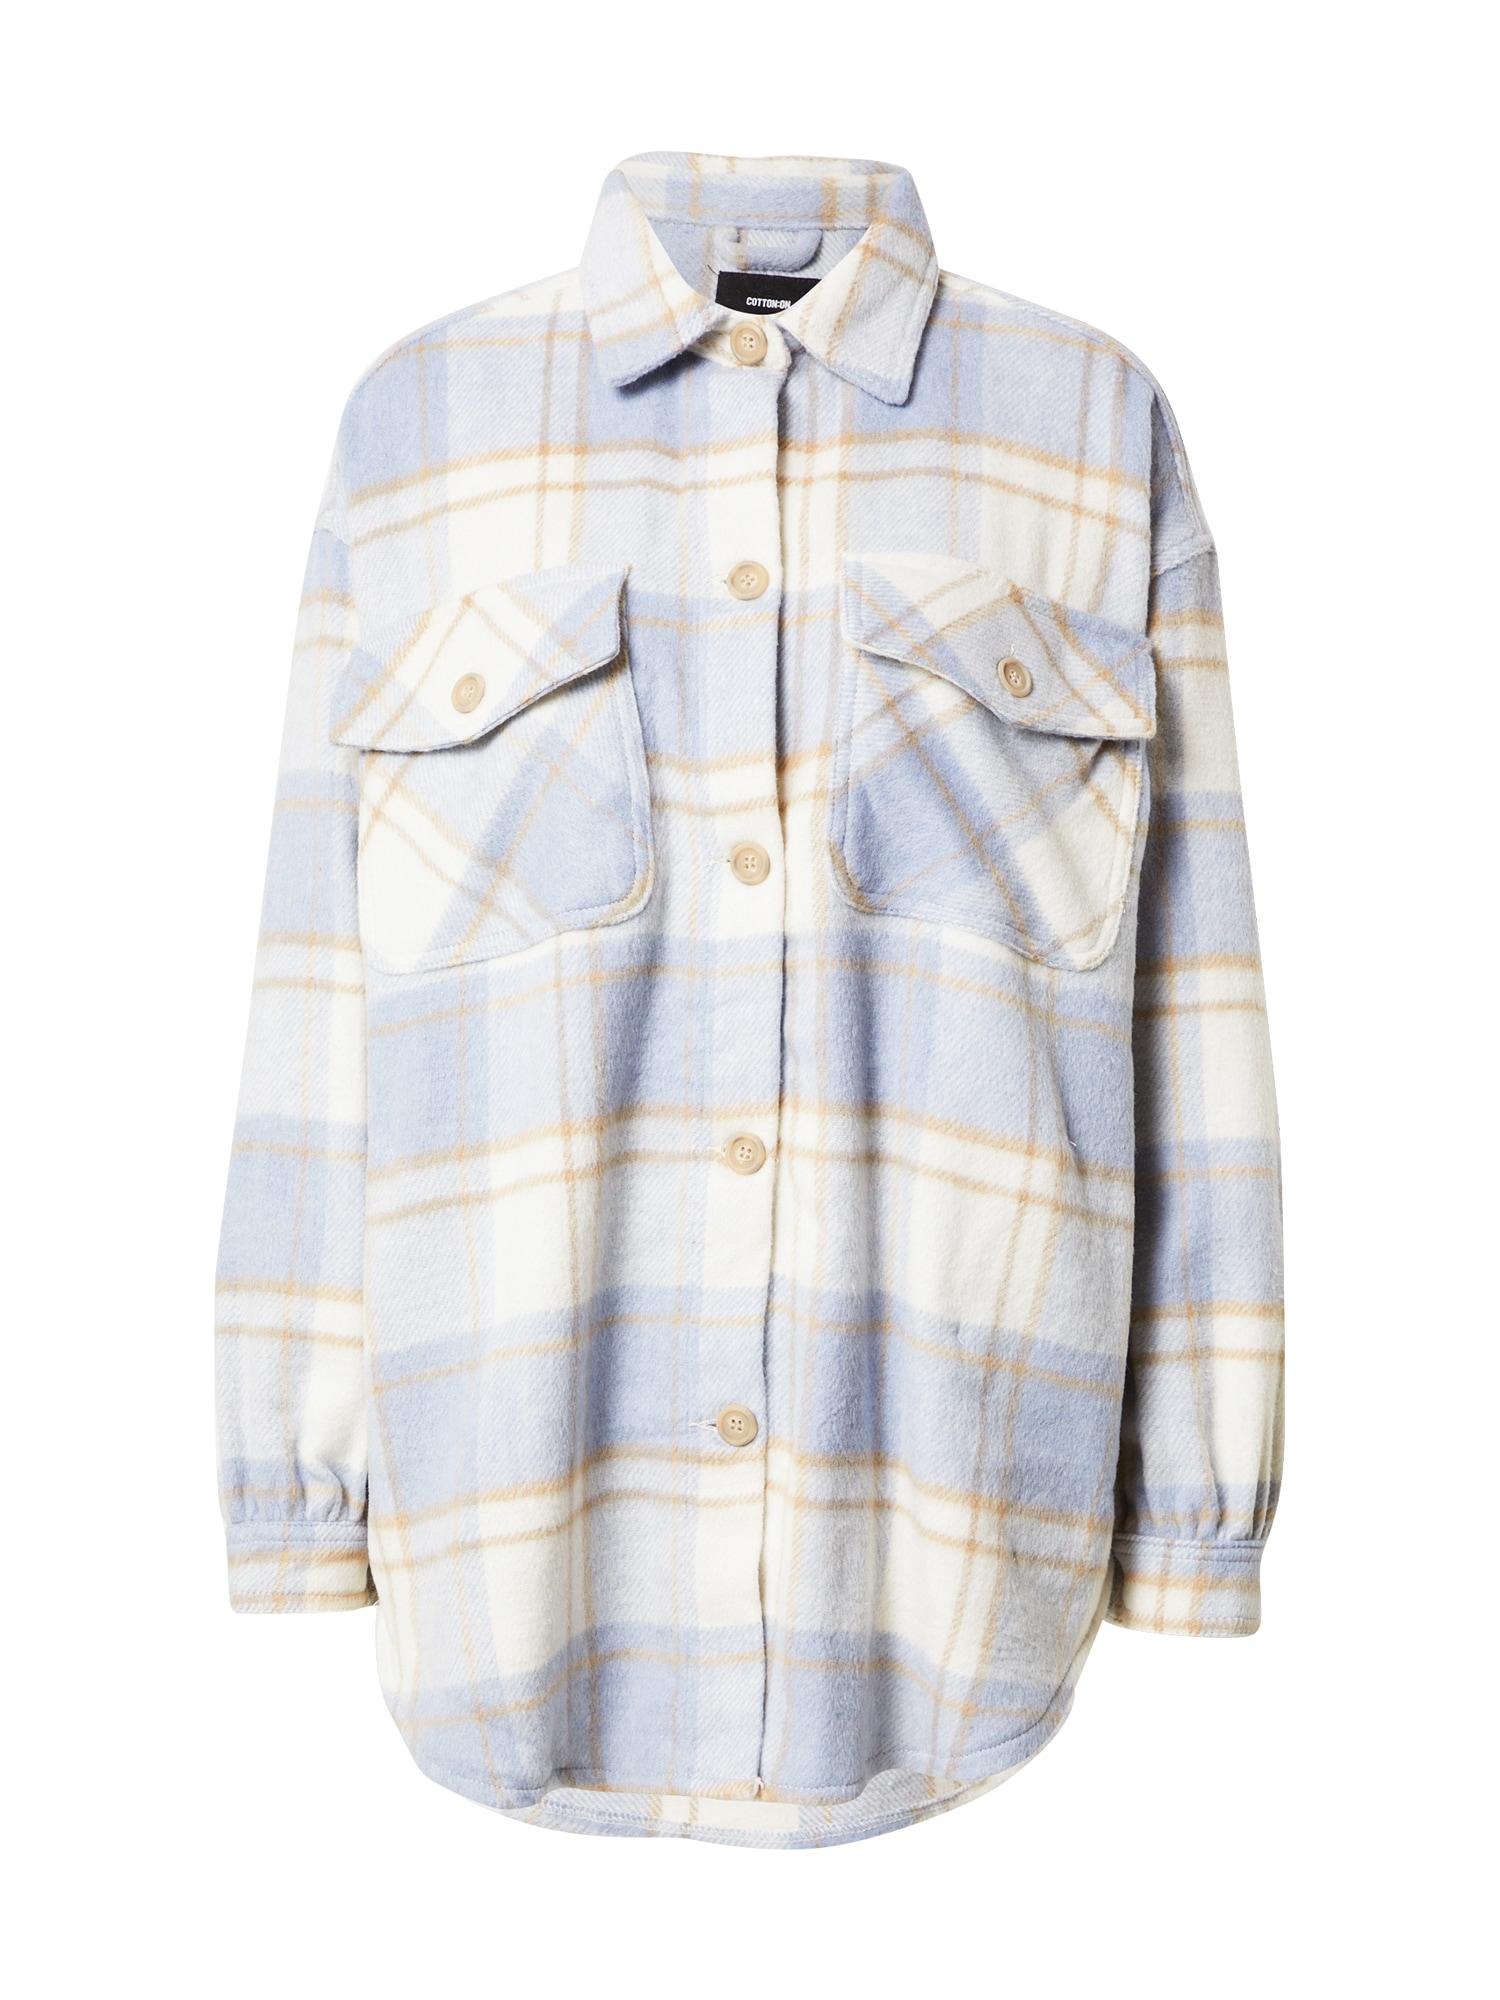 Cotton On Demisezoninė striukė mėlyna dūmų spalva / balta / gelsvai pilka spalva